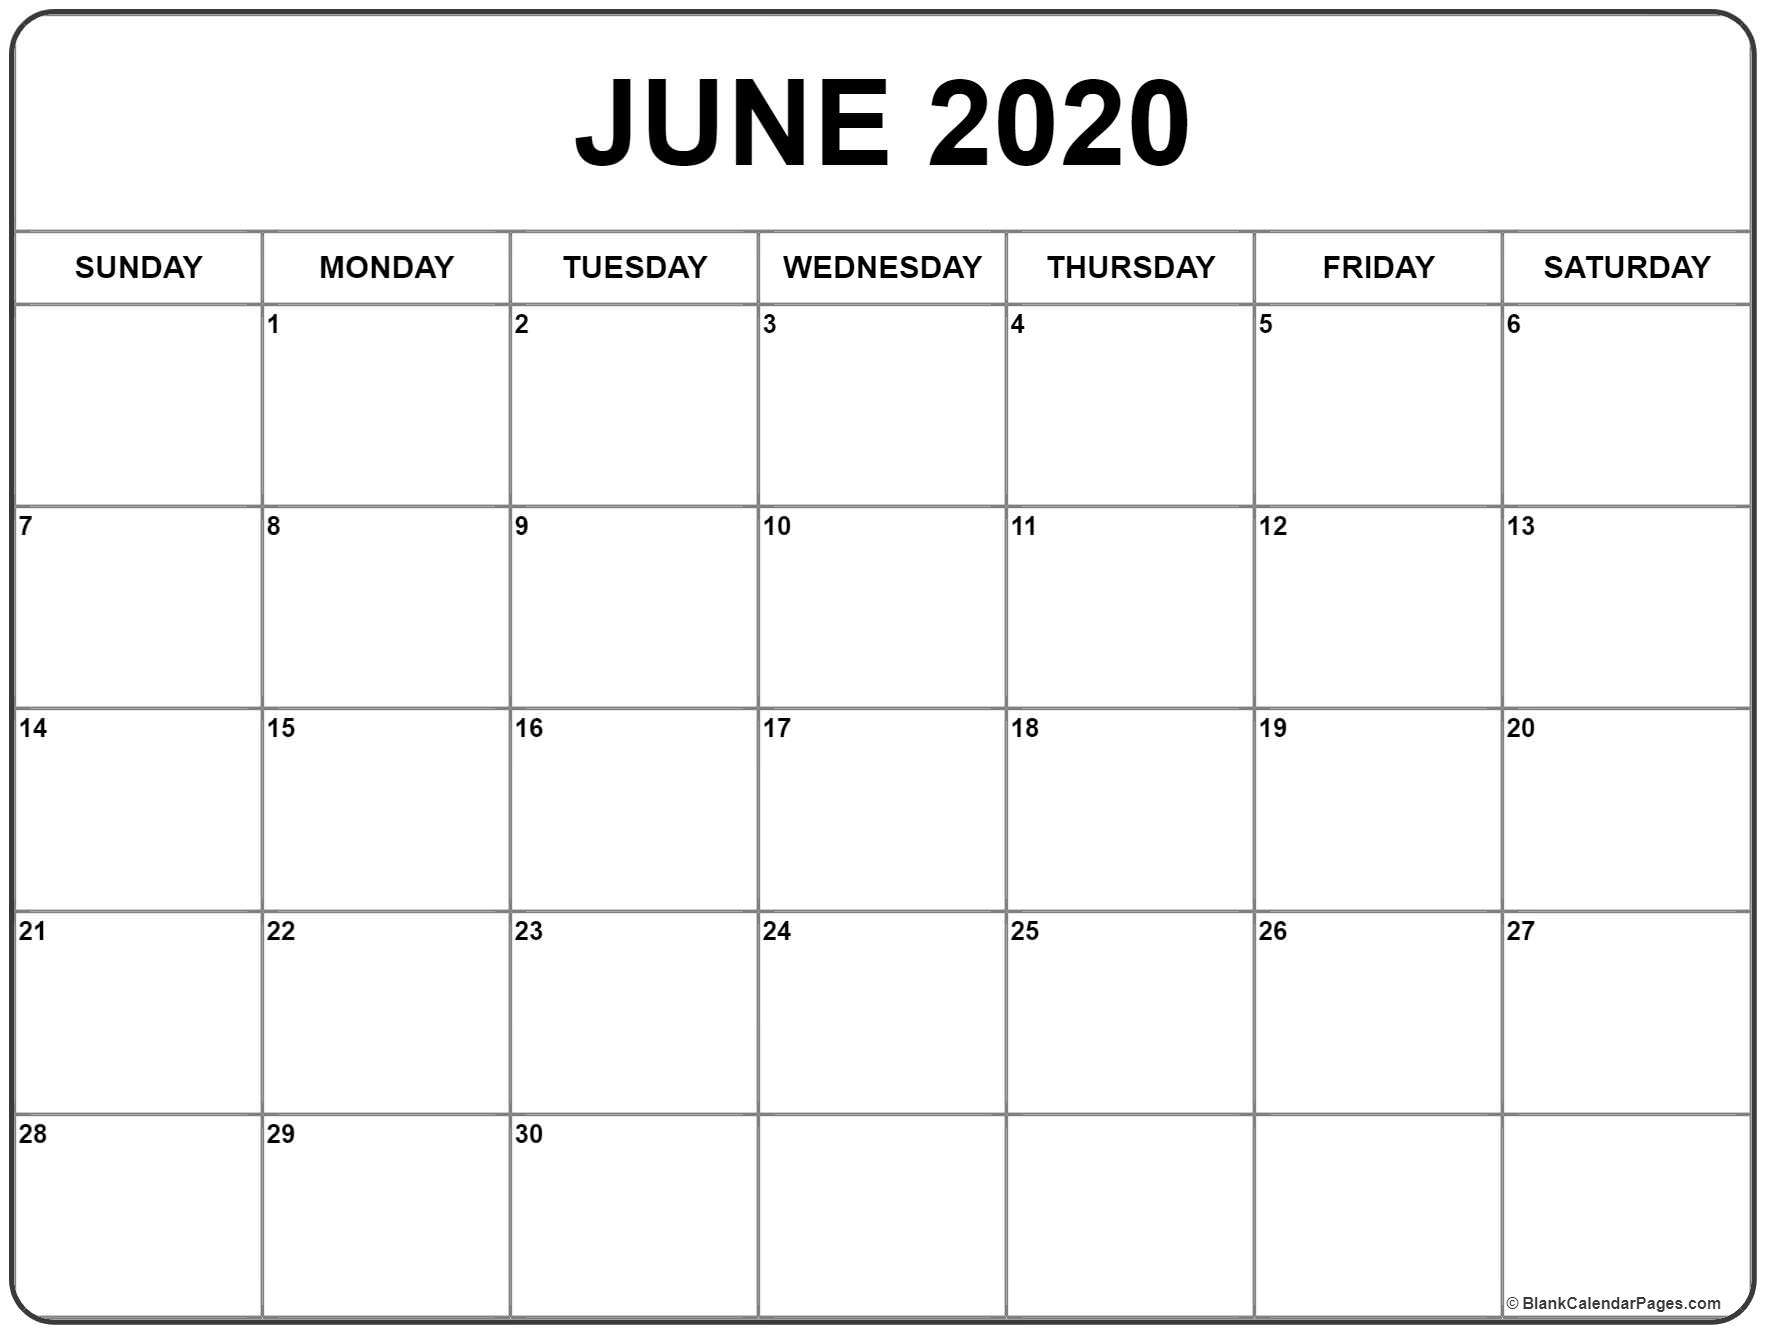 June 2020 Calendar | Free Printable Monthly Calendars inside Printable Calendar July 2019 To June 2020